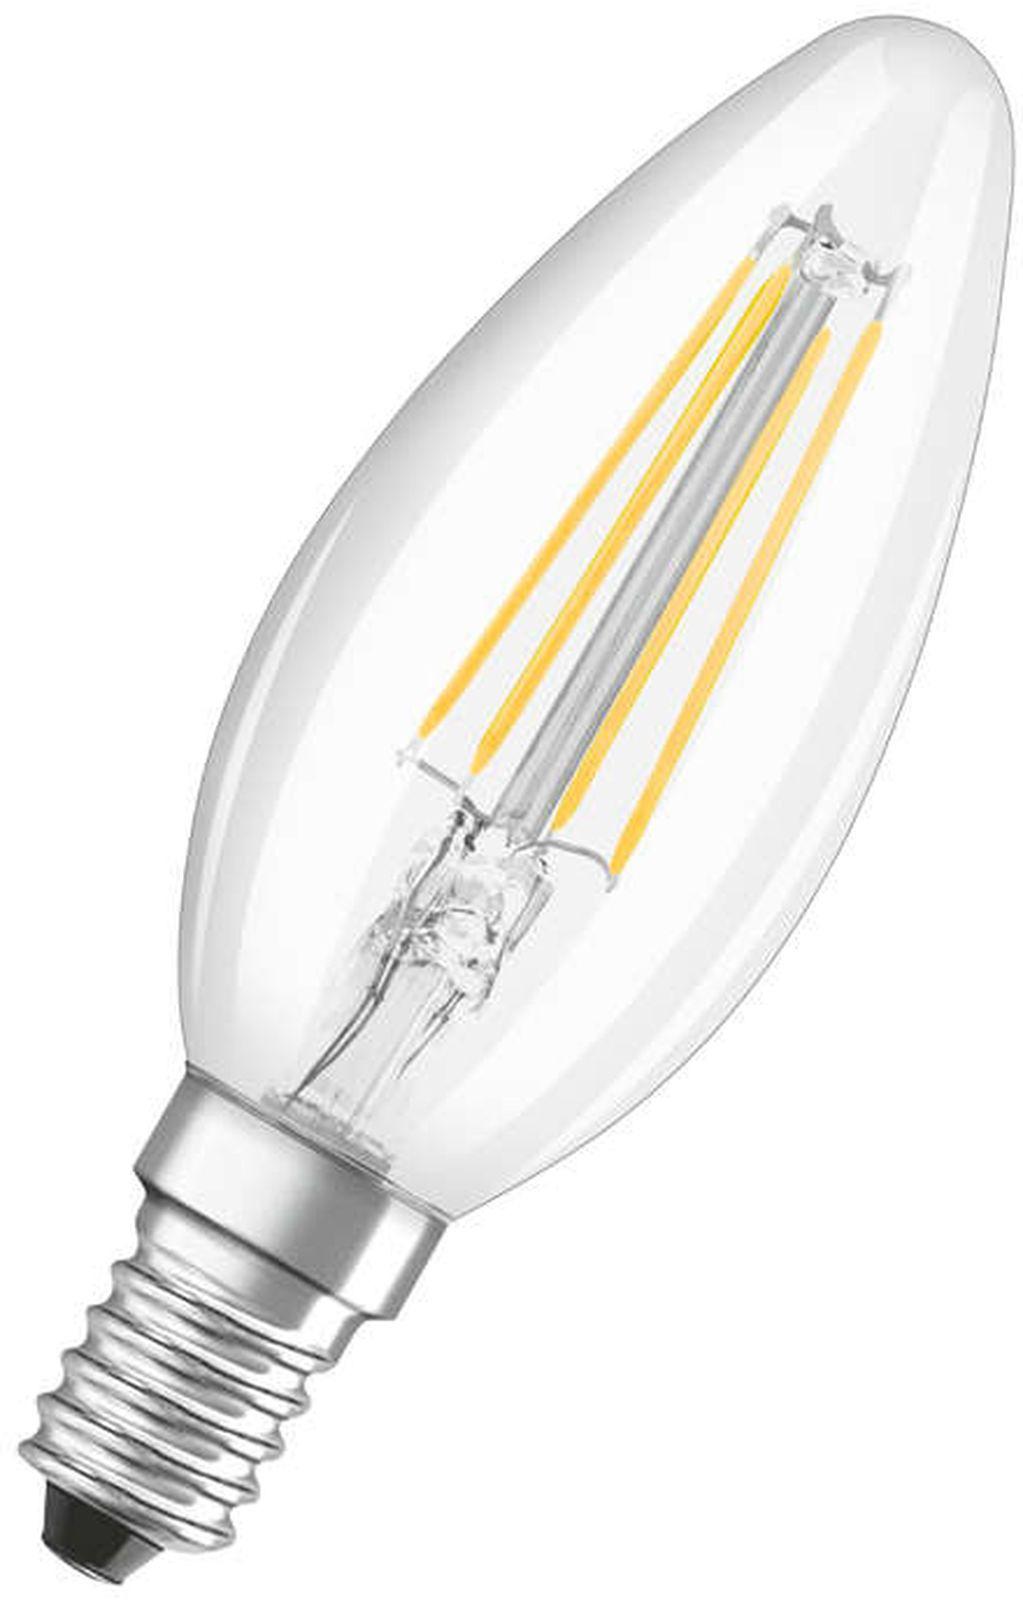 Лампочка Ledvance Osram светодиодная LSCLB6, Теплый свет 5 Вт, Светодиодная лампочка philips теплый свет 14 5 вт светодиодная